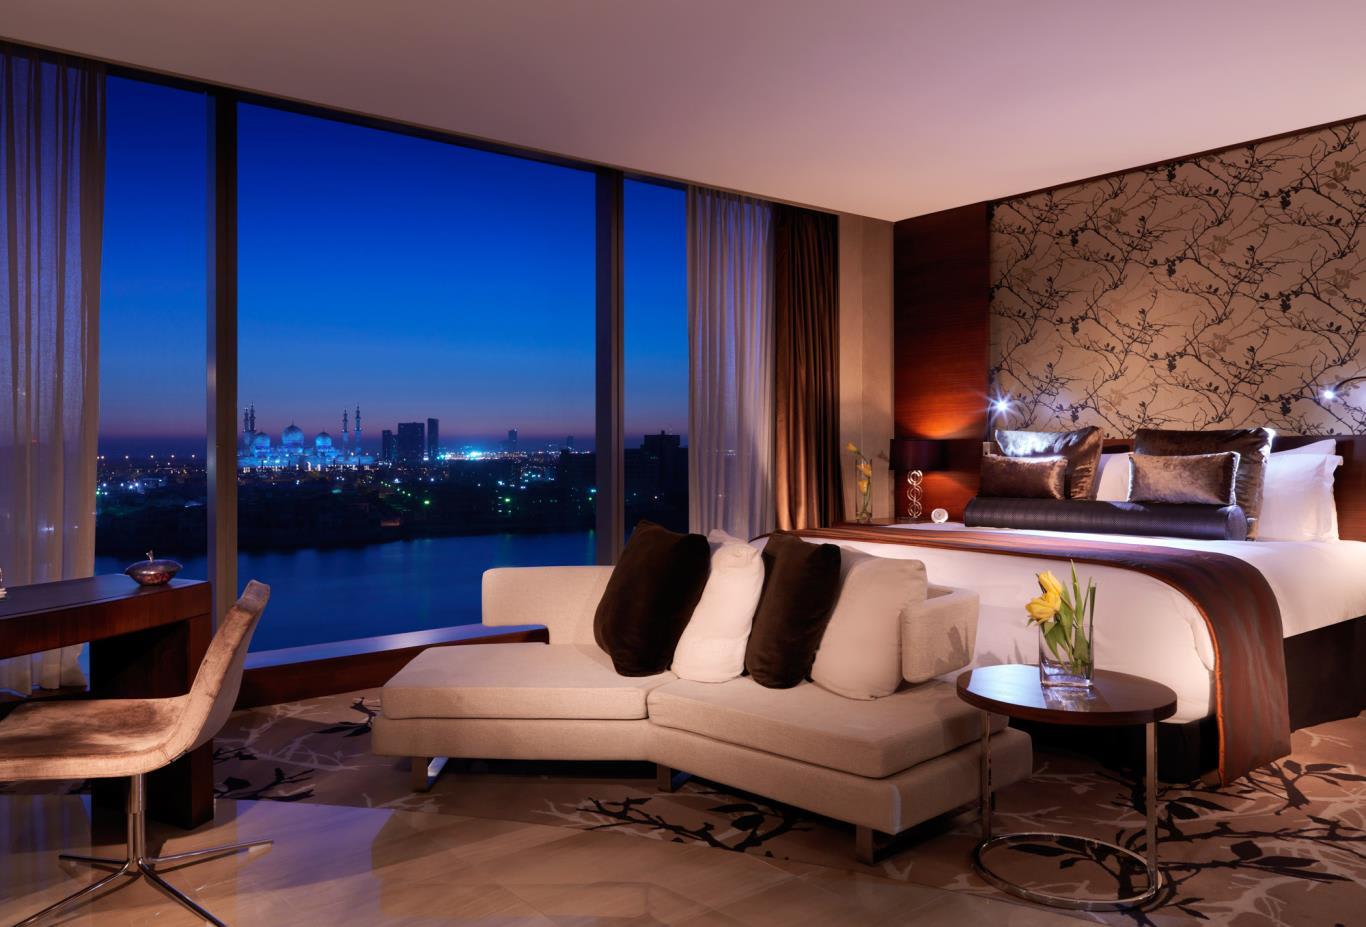 Fairmont-Gold-View-Room